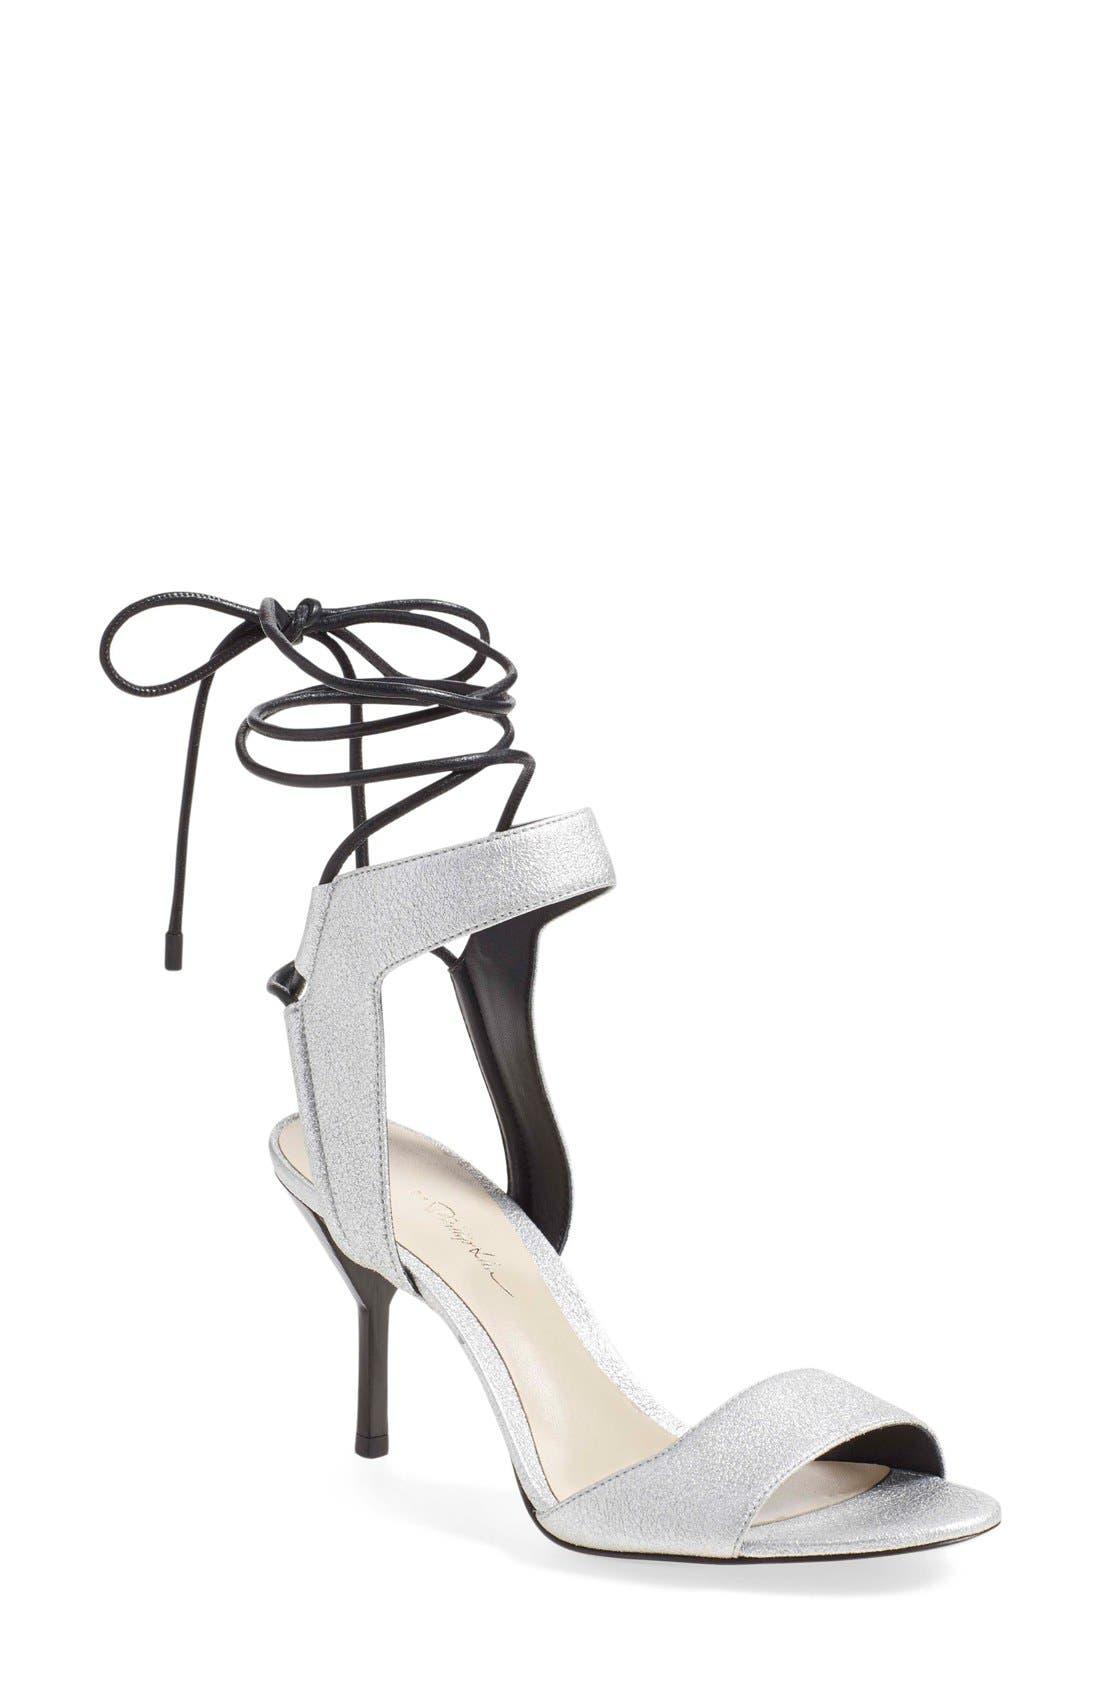 Main Image - 3.1 Phillip Lim 'Martini' Wraparound Ankle Strap Sandal (Women)